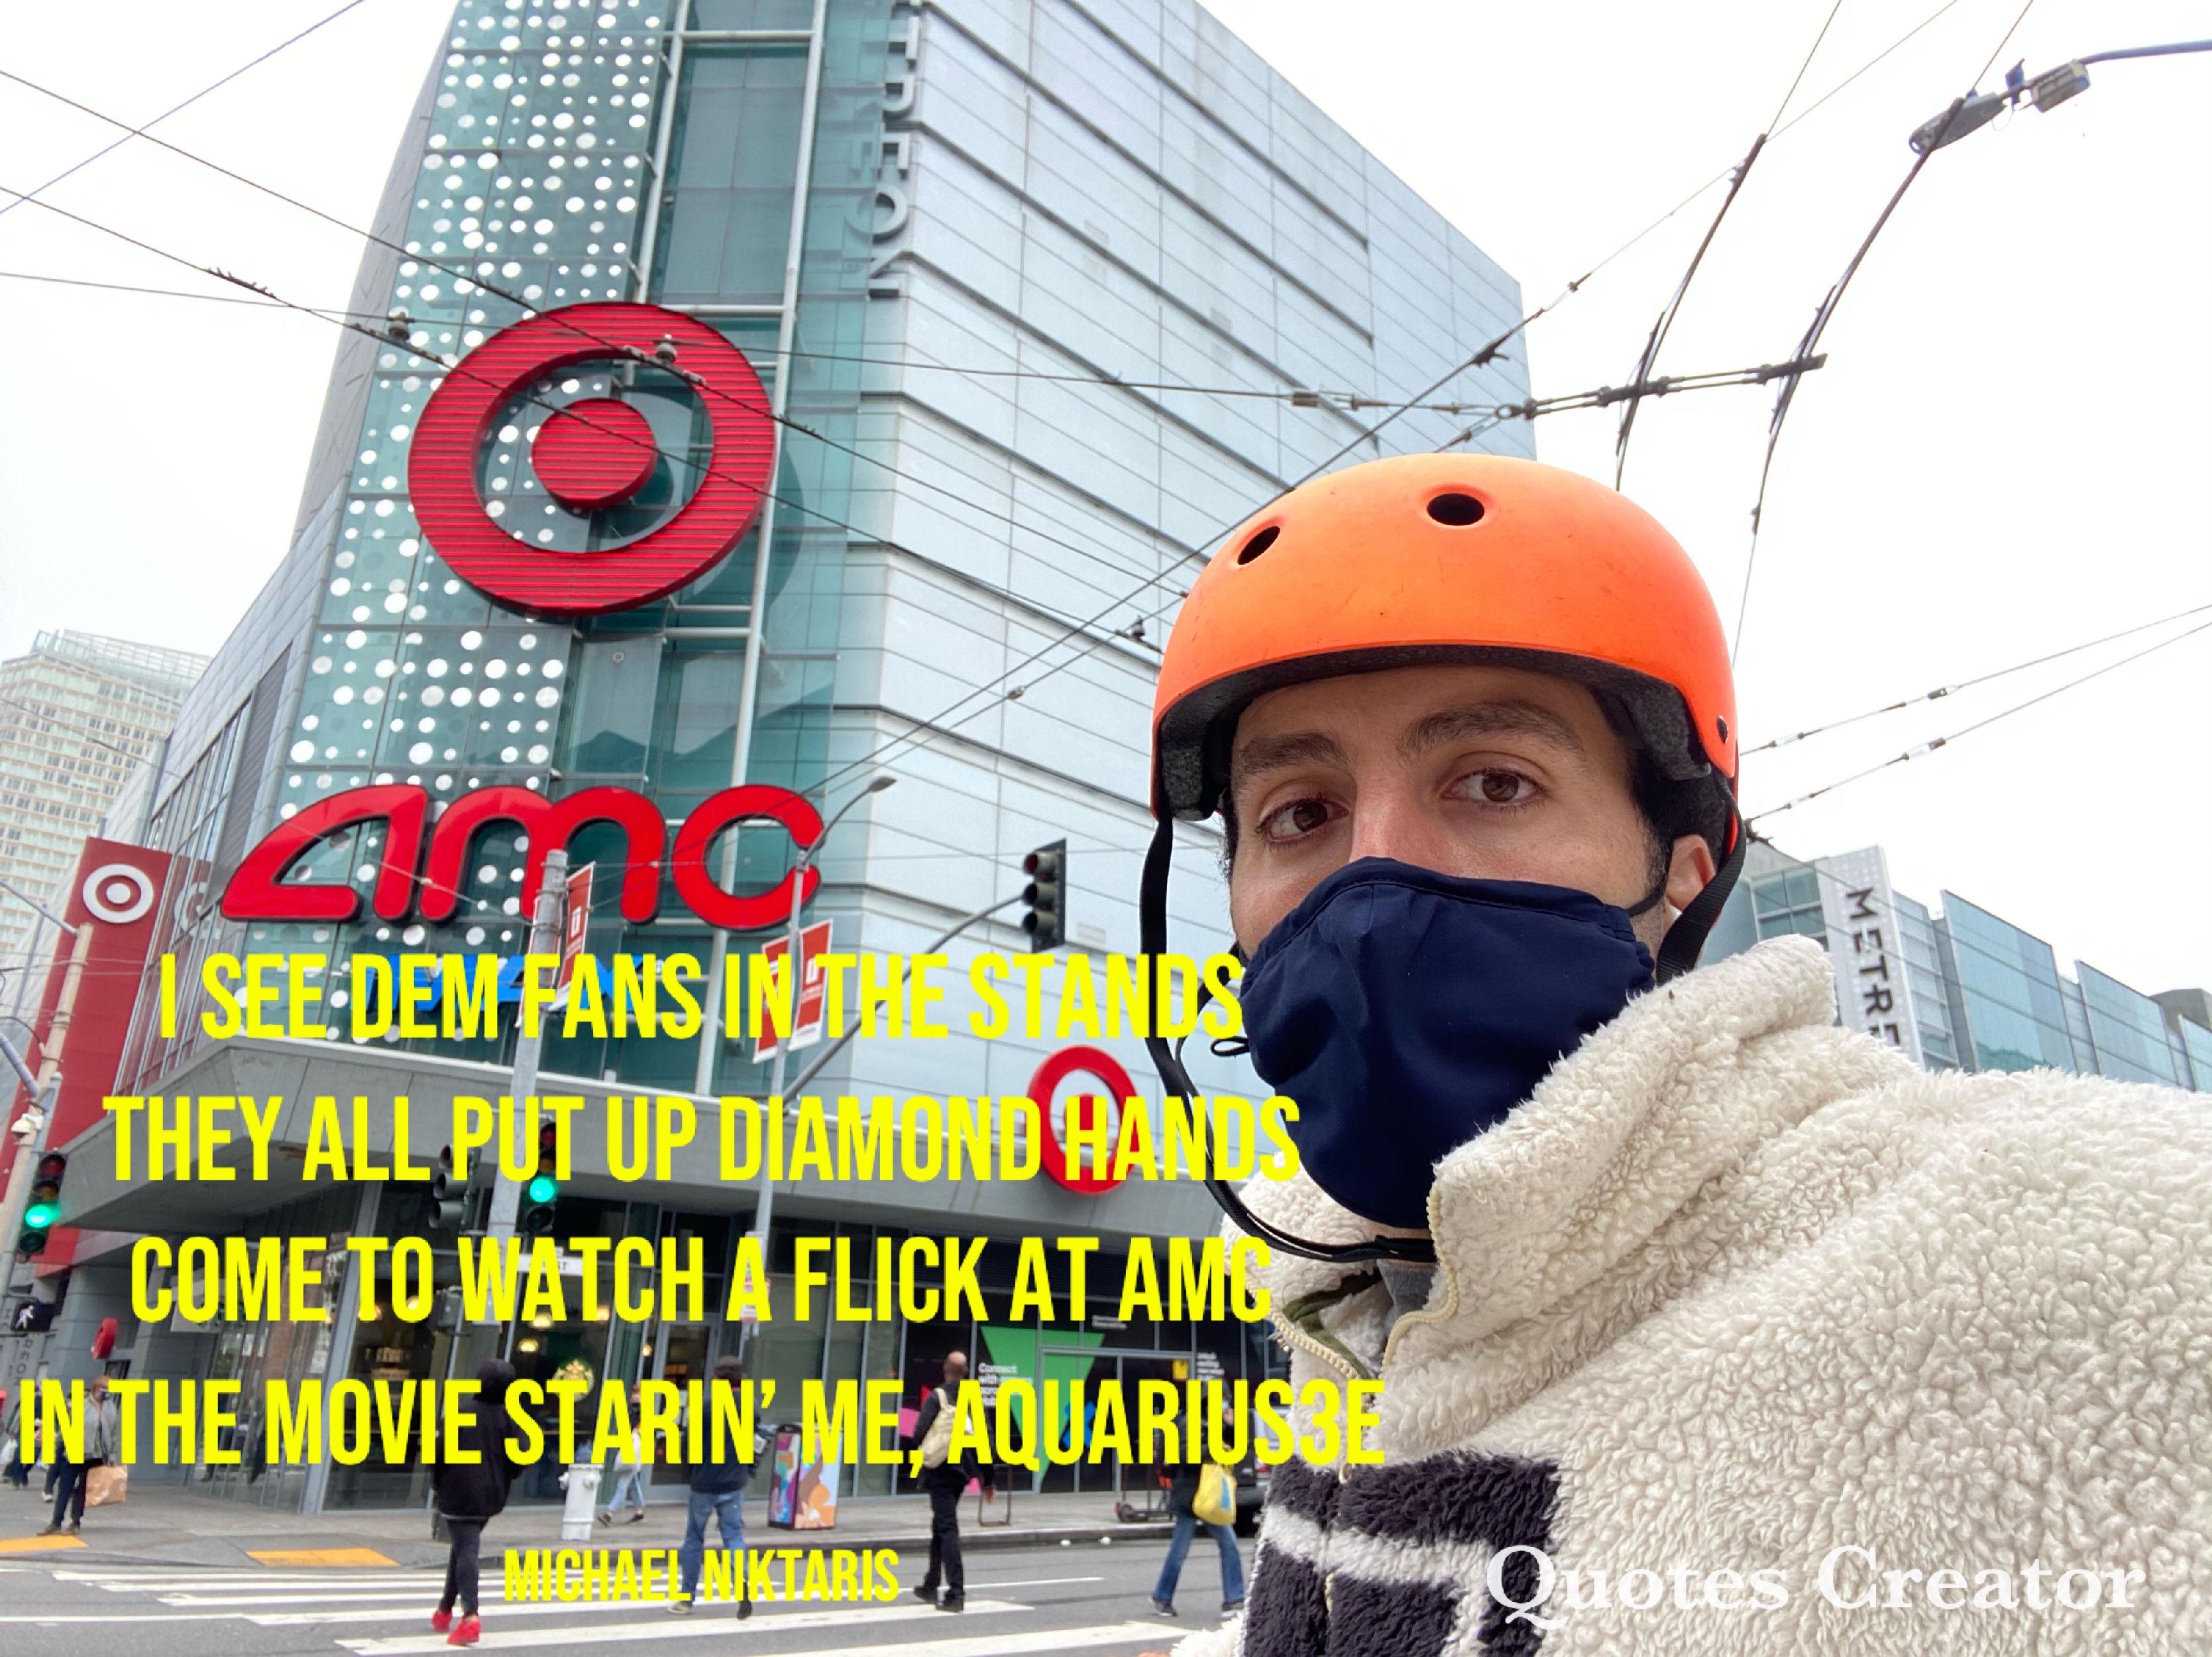 San Francisco AMC vibes